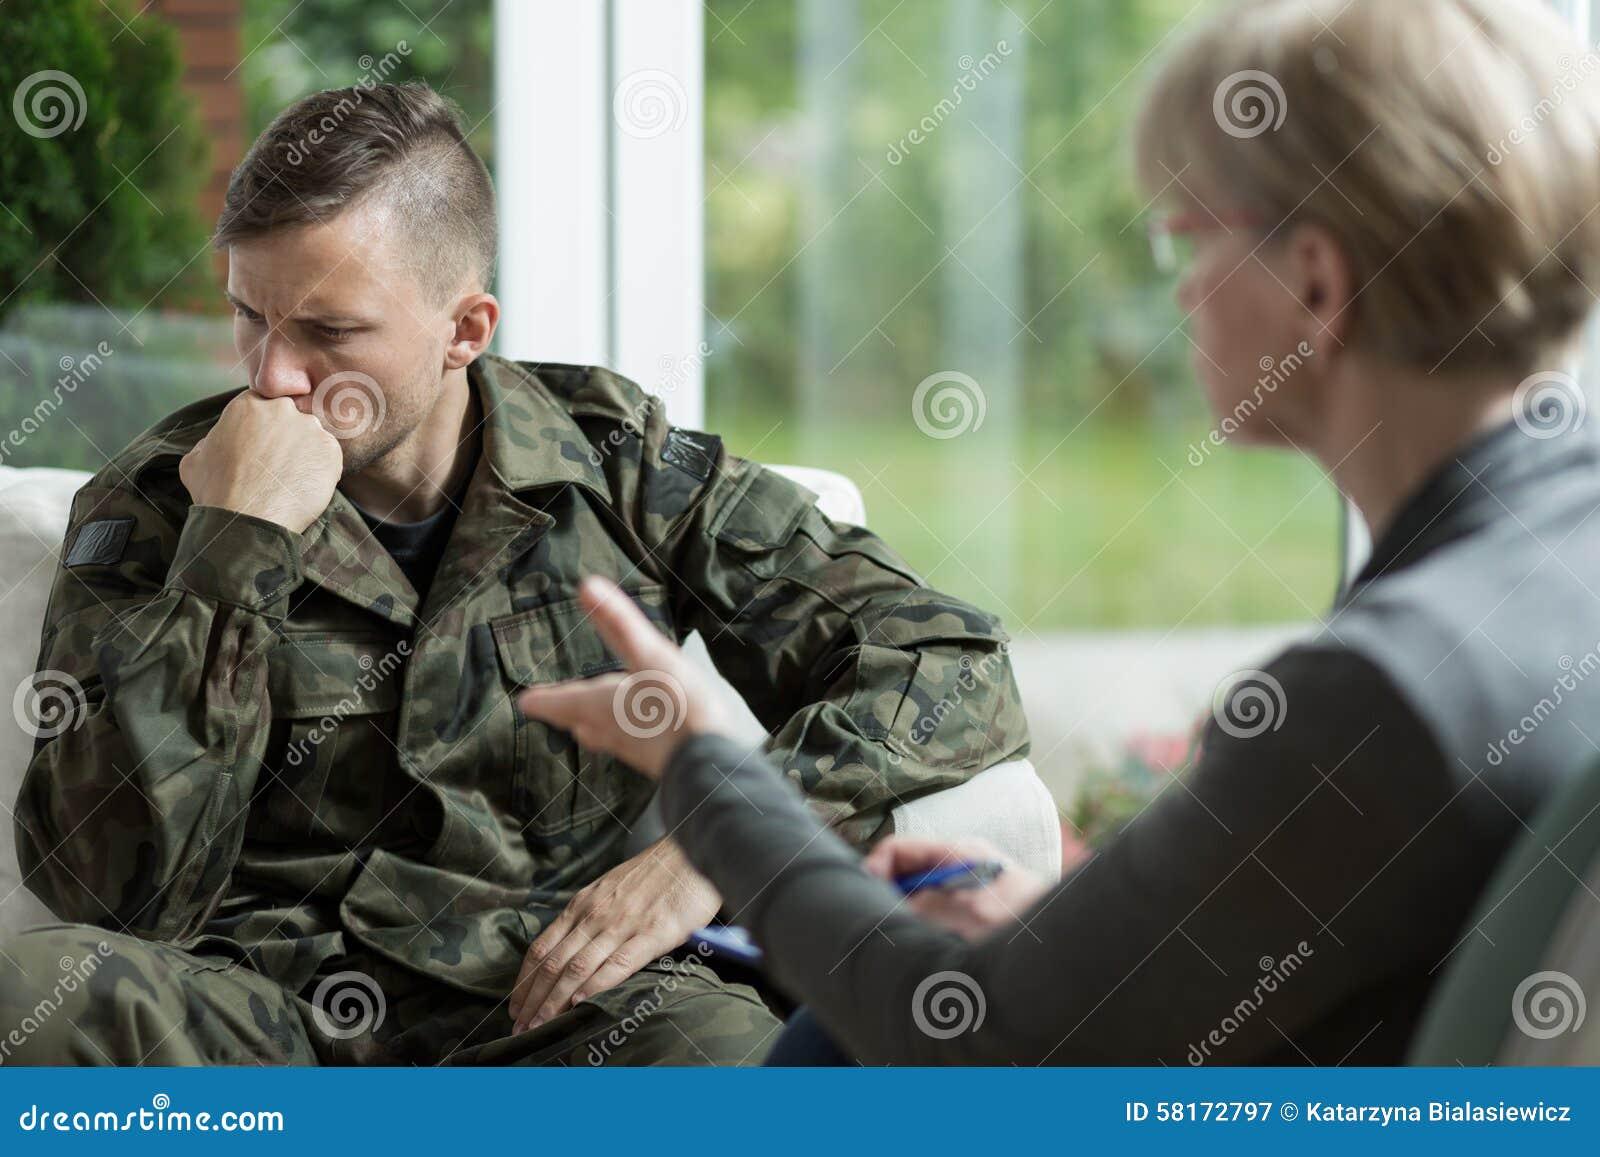 Veterano de guerra con problemas